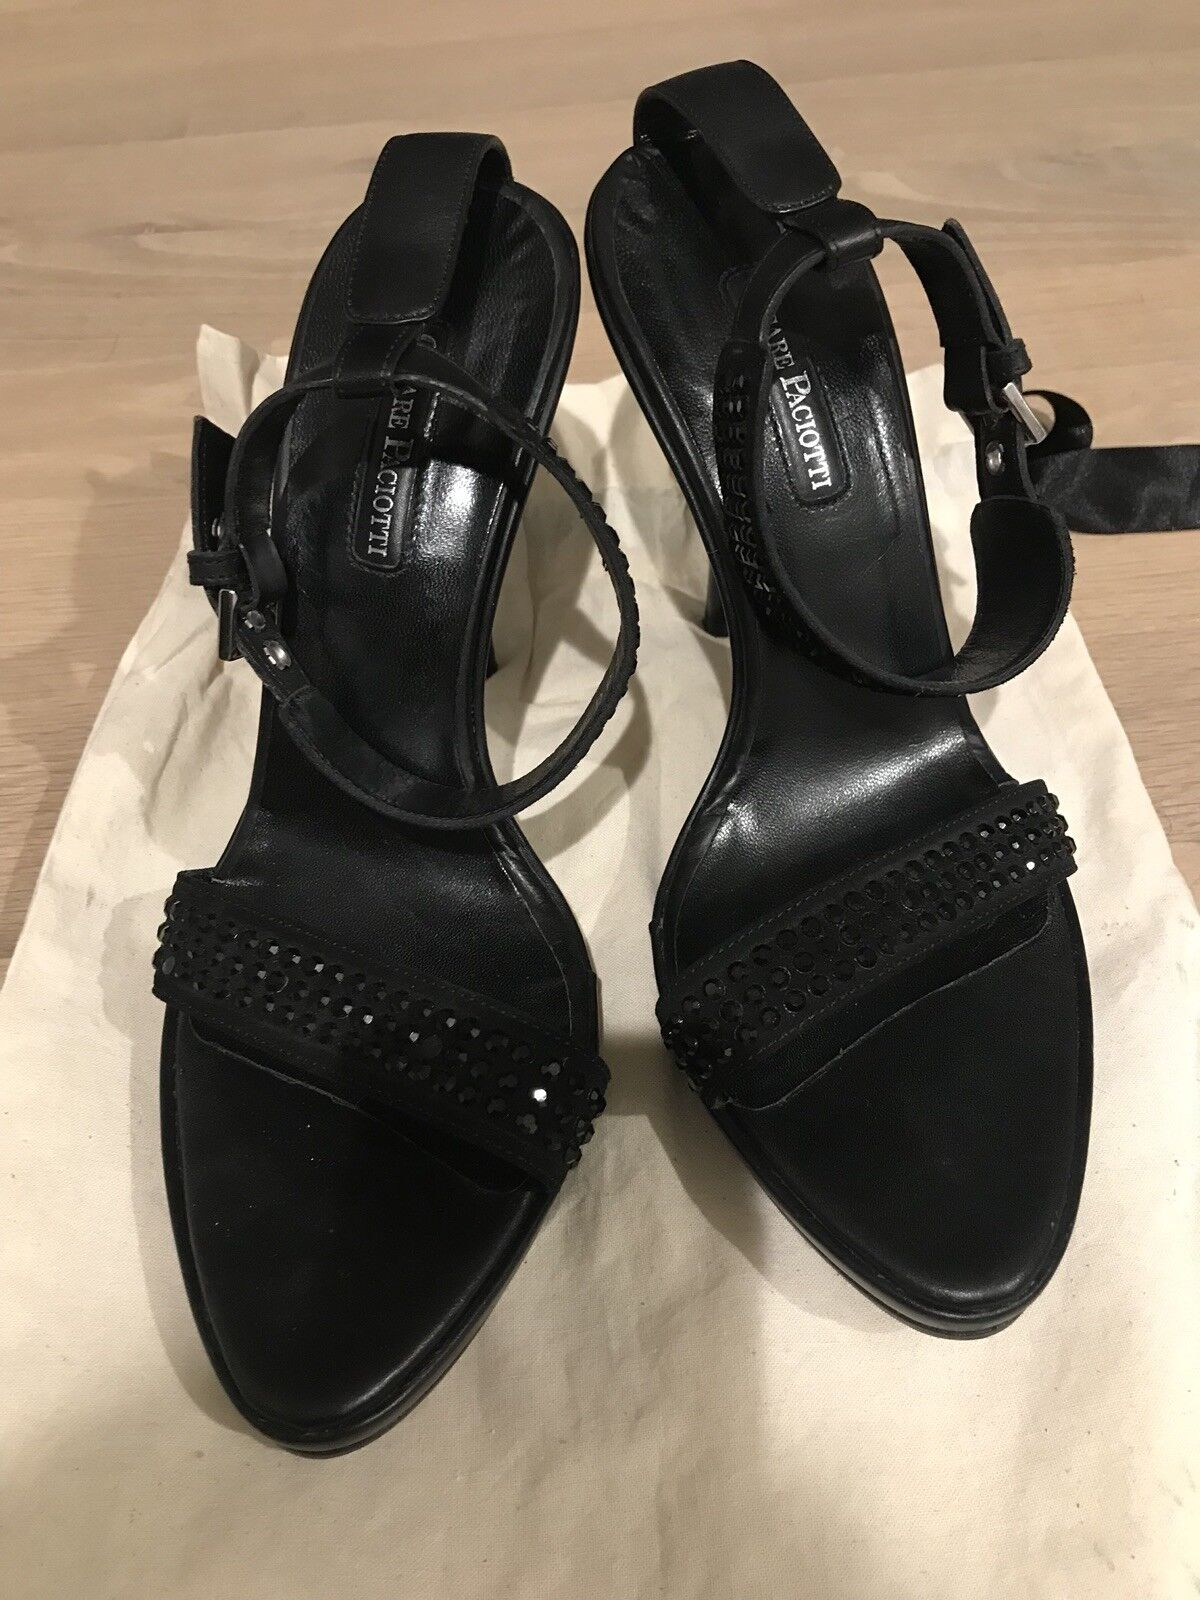 SEXY    Cesare Paciotti High HEEL BLACK Suede Embellished SANDALS EU38,5 US 8